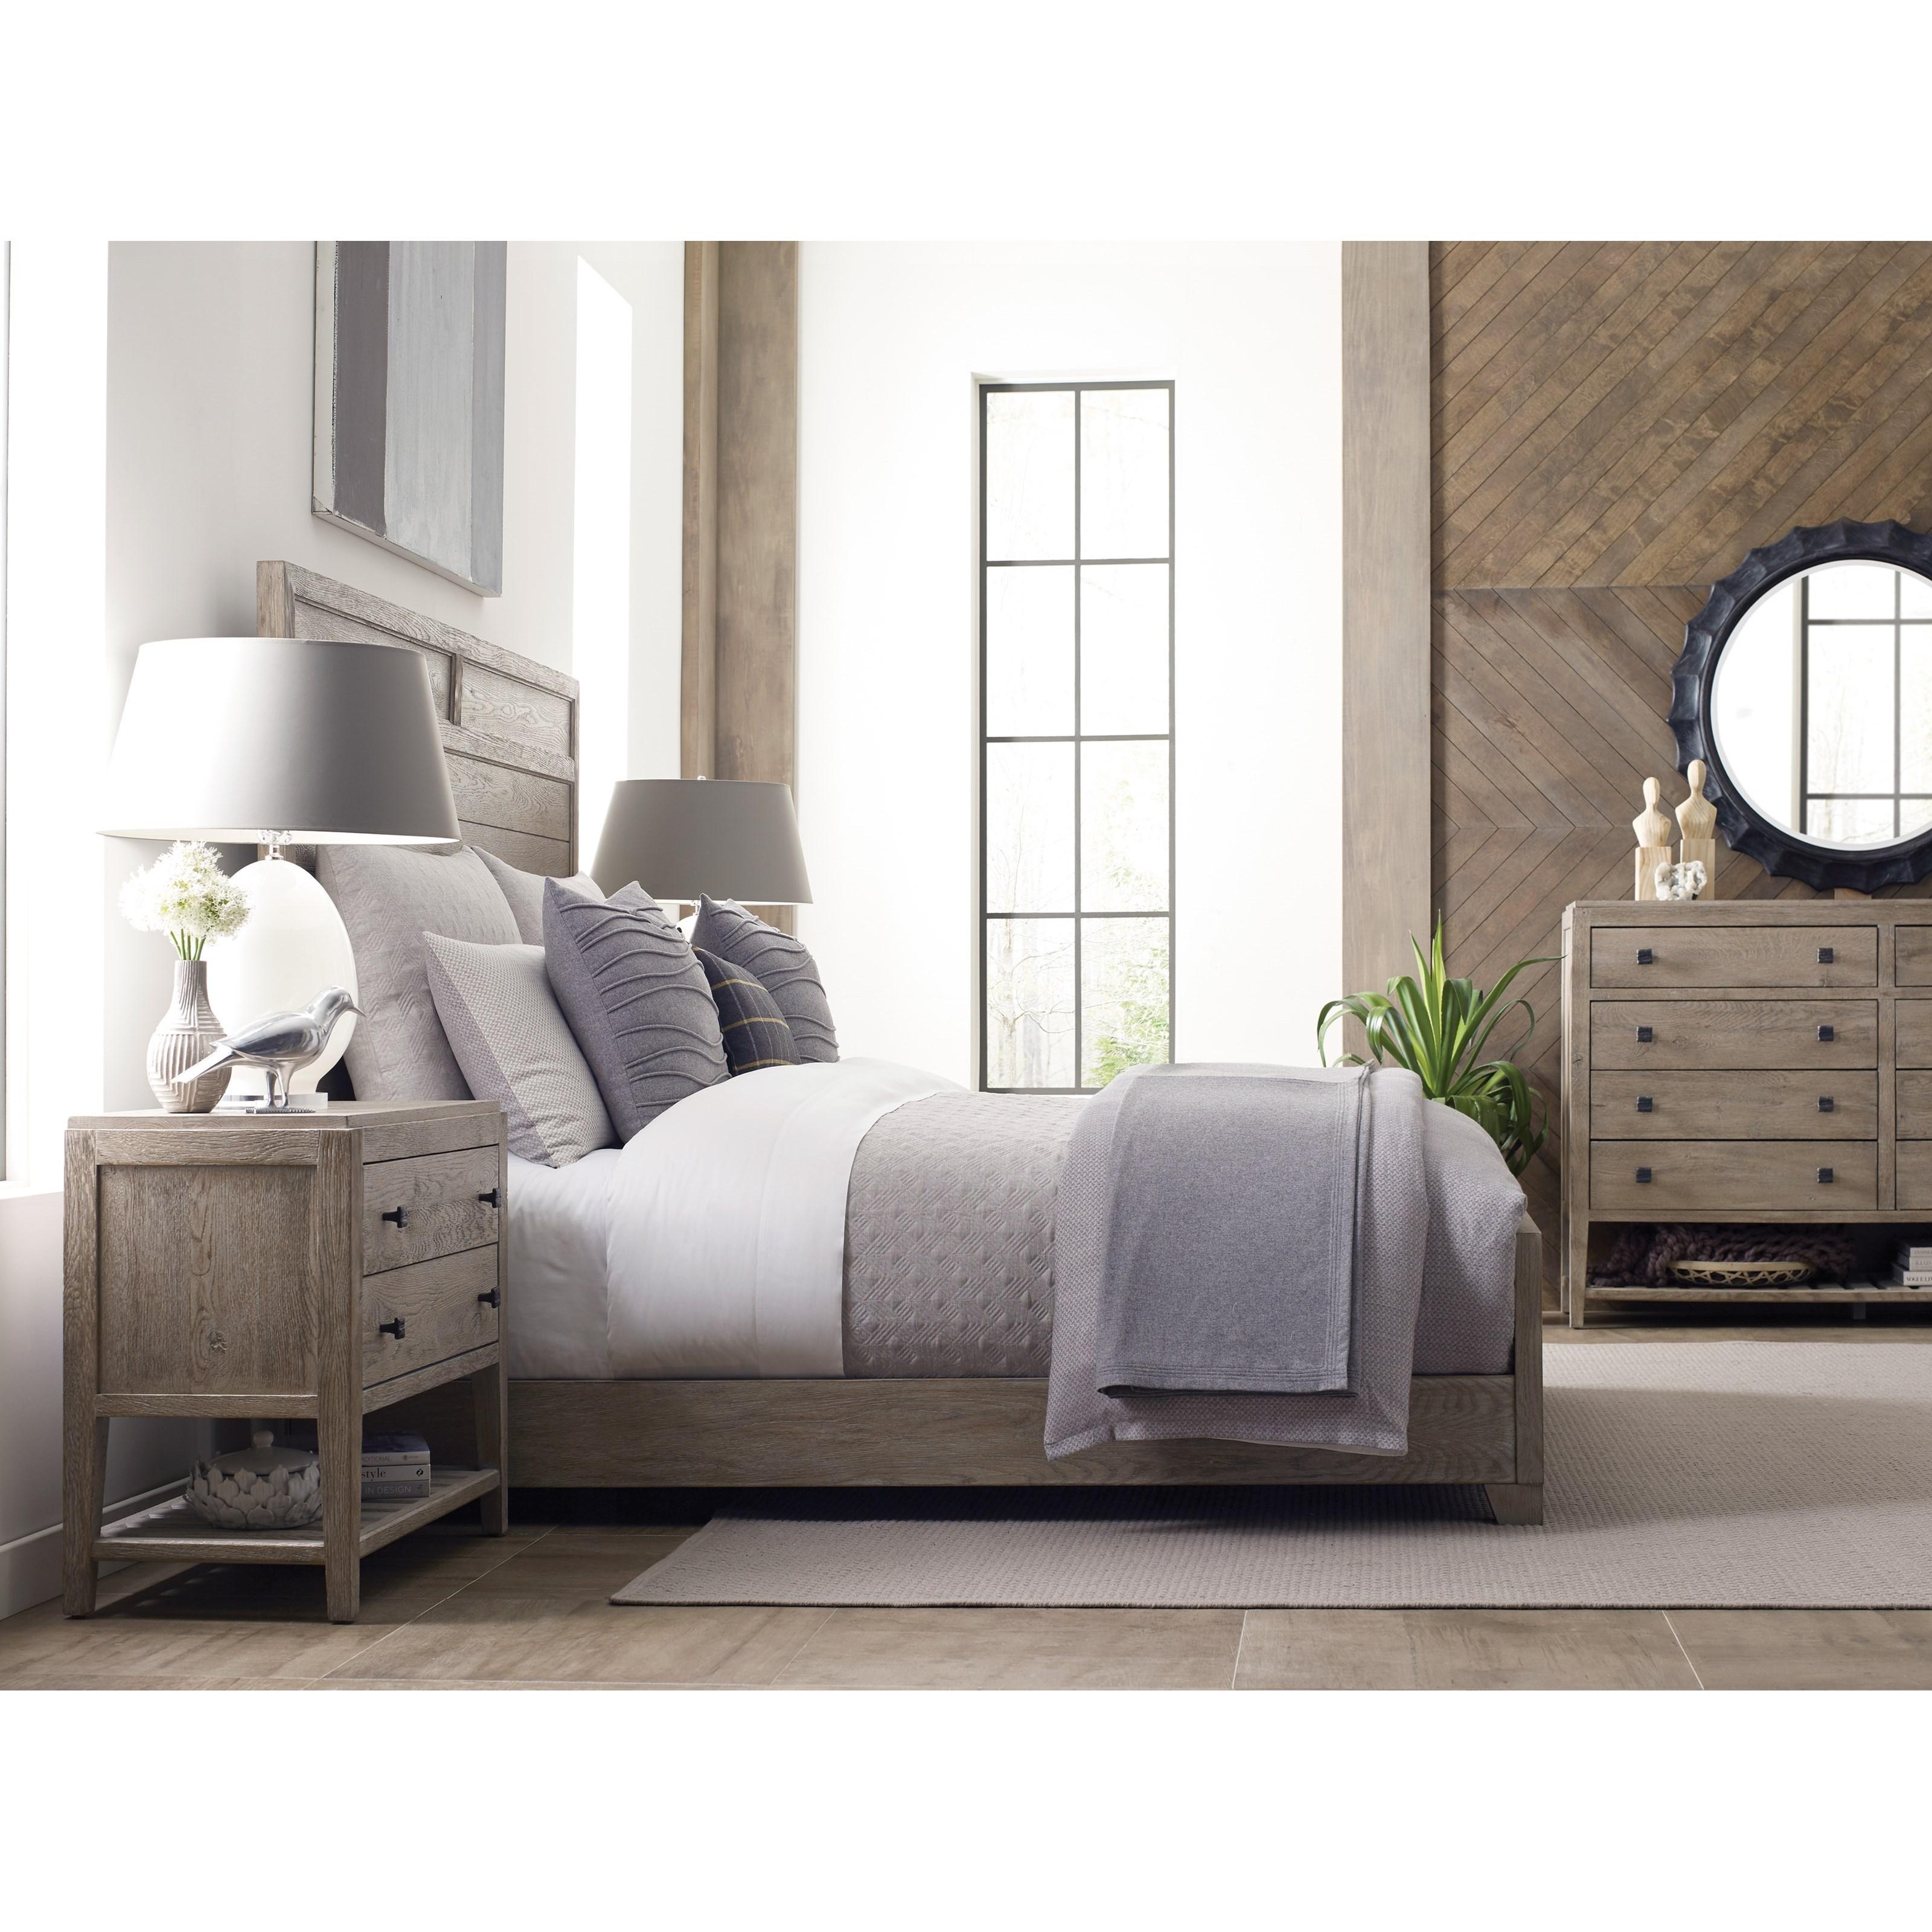 Kincaid furniture trails king bedroom group johnny - Kincaid bedroom furniture for sale ...